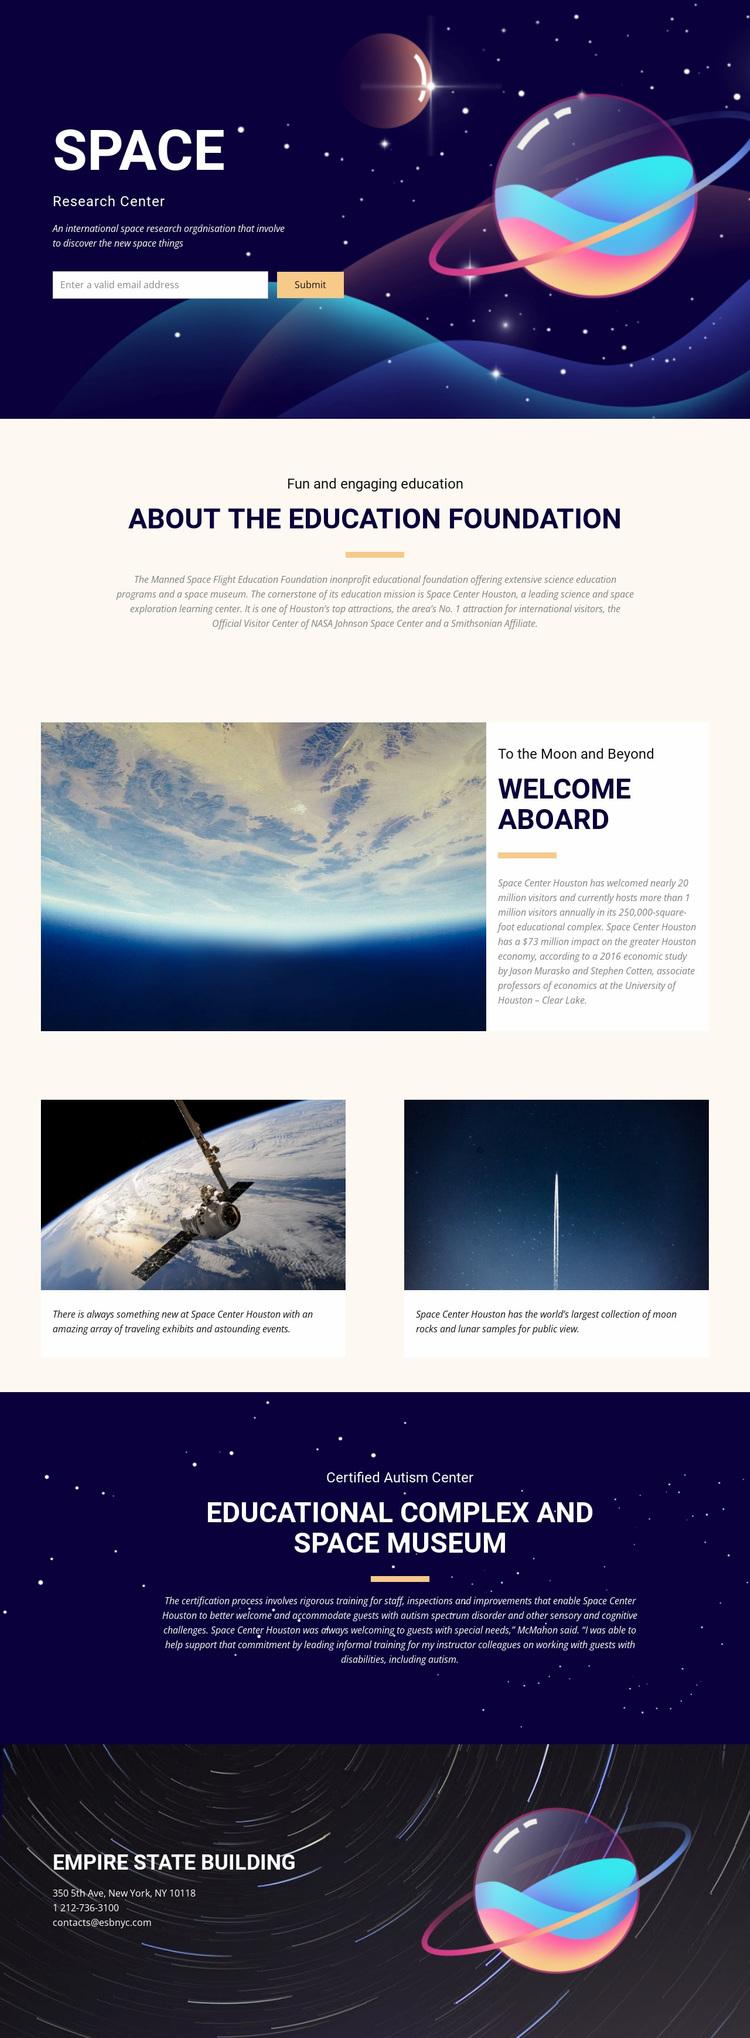 Space Website Design